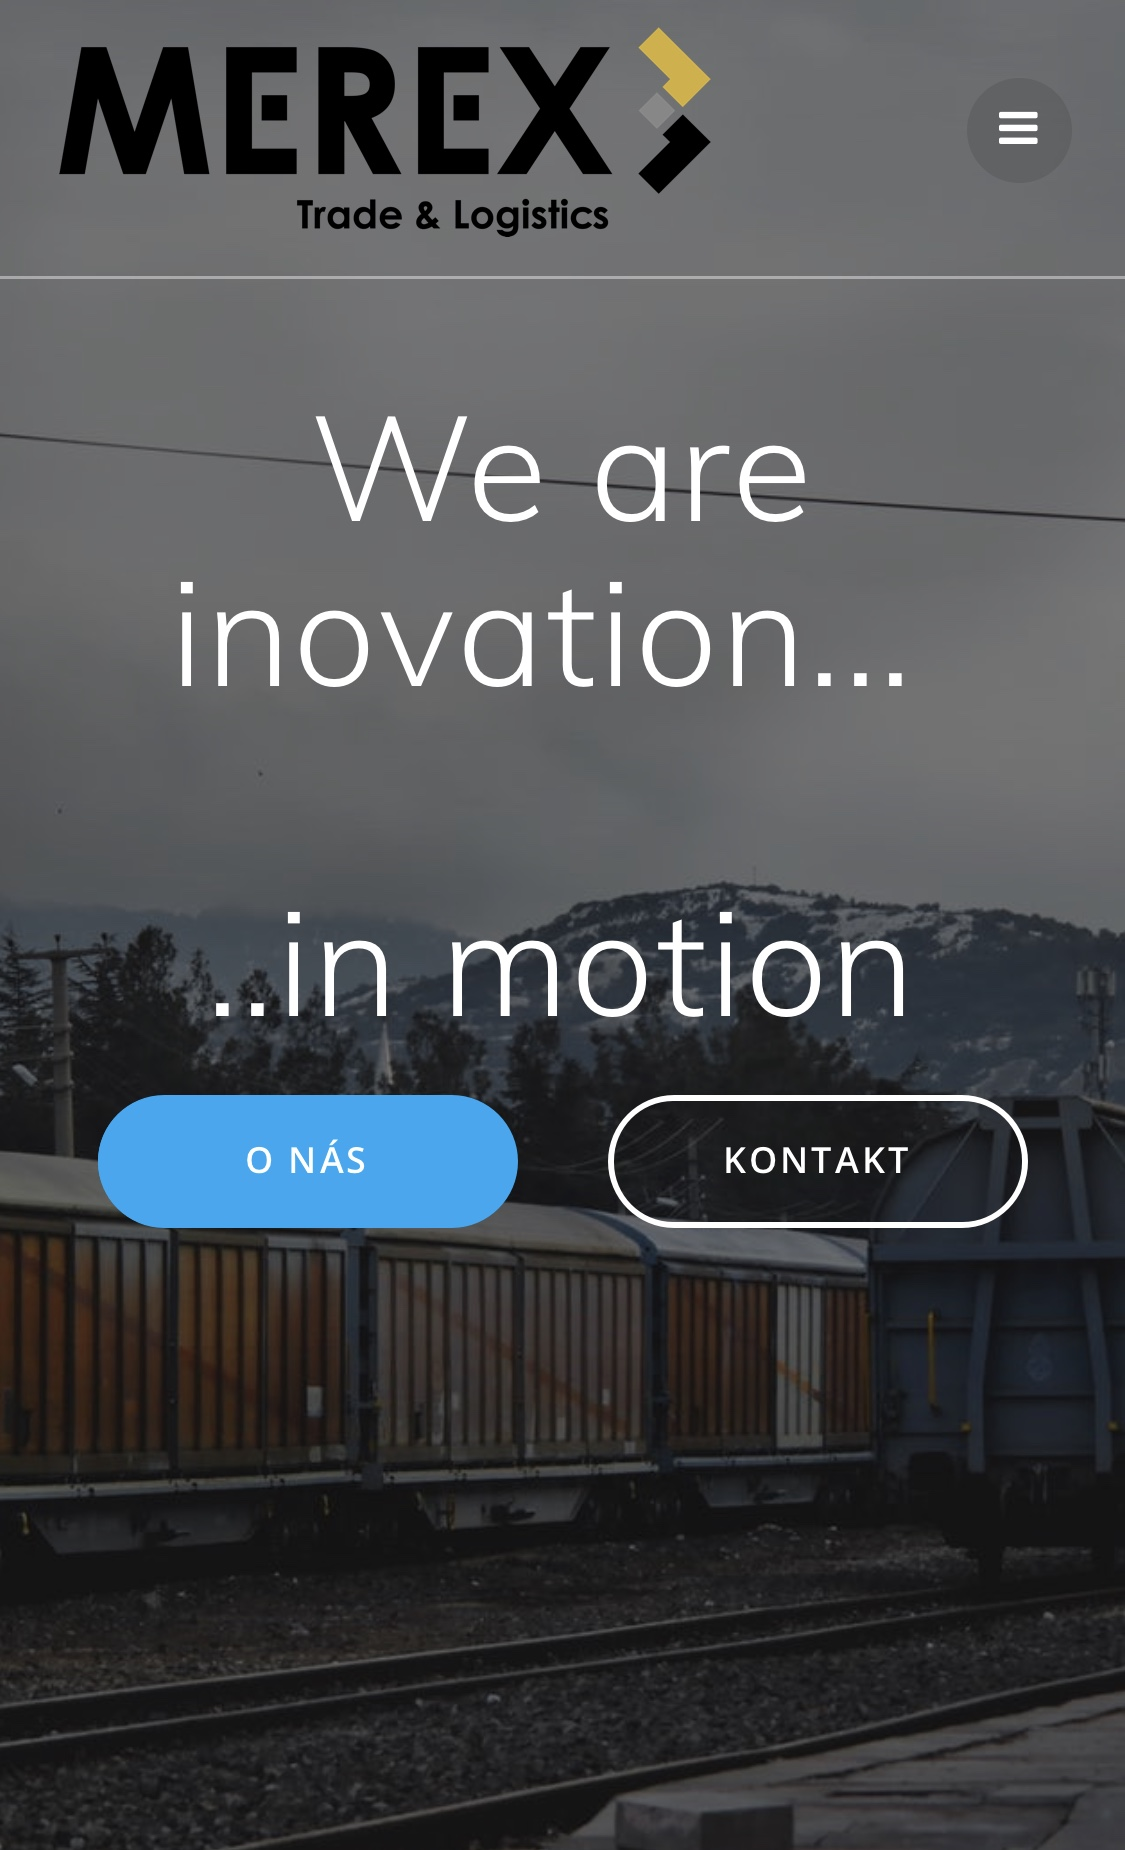 web-responzivni-verze-pro-mobil.jpg